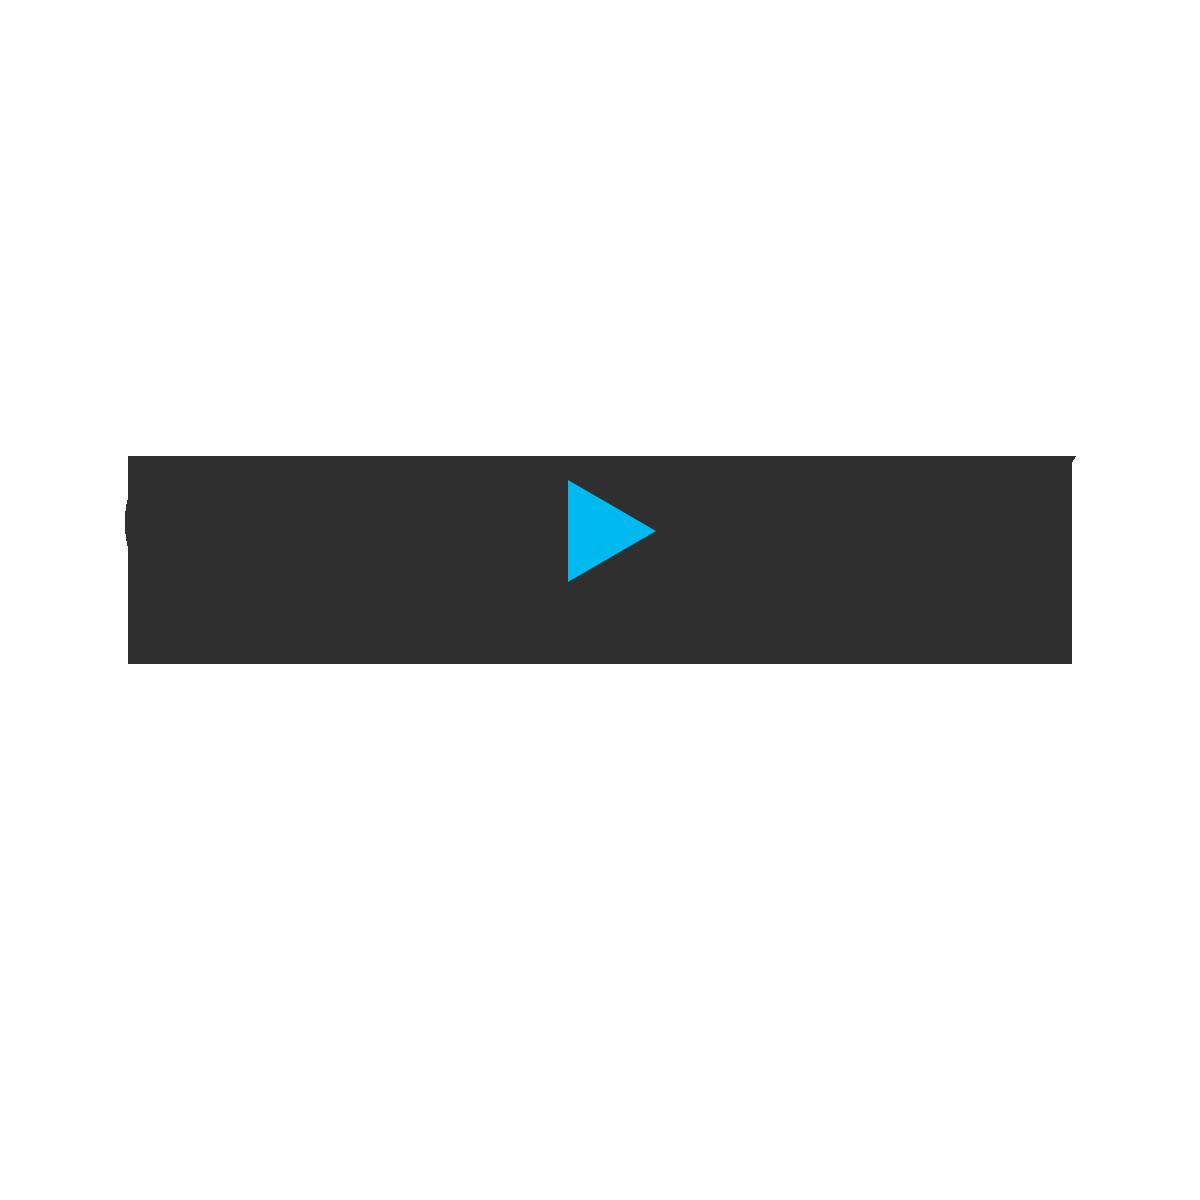 Surfy.nl